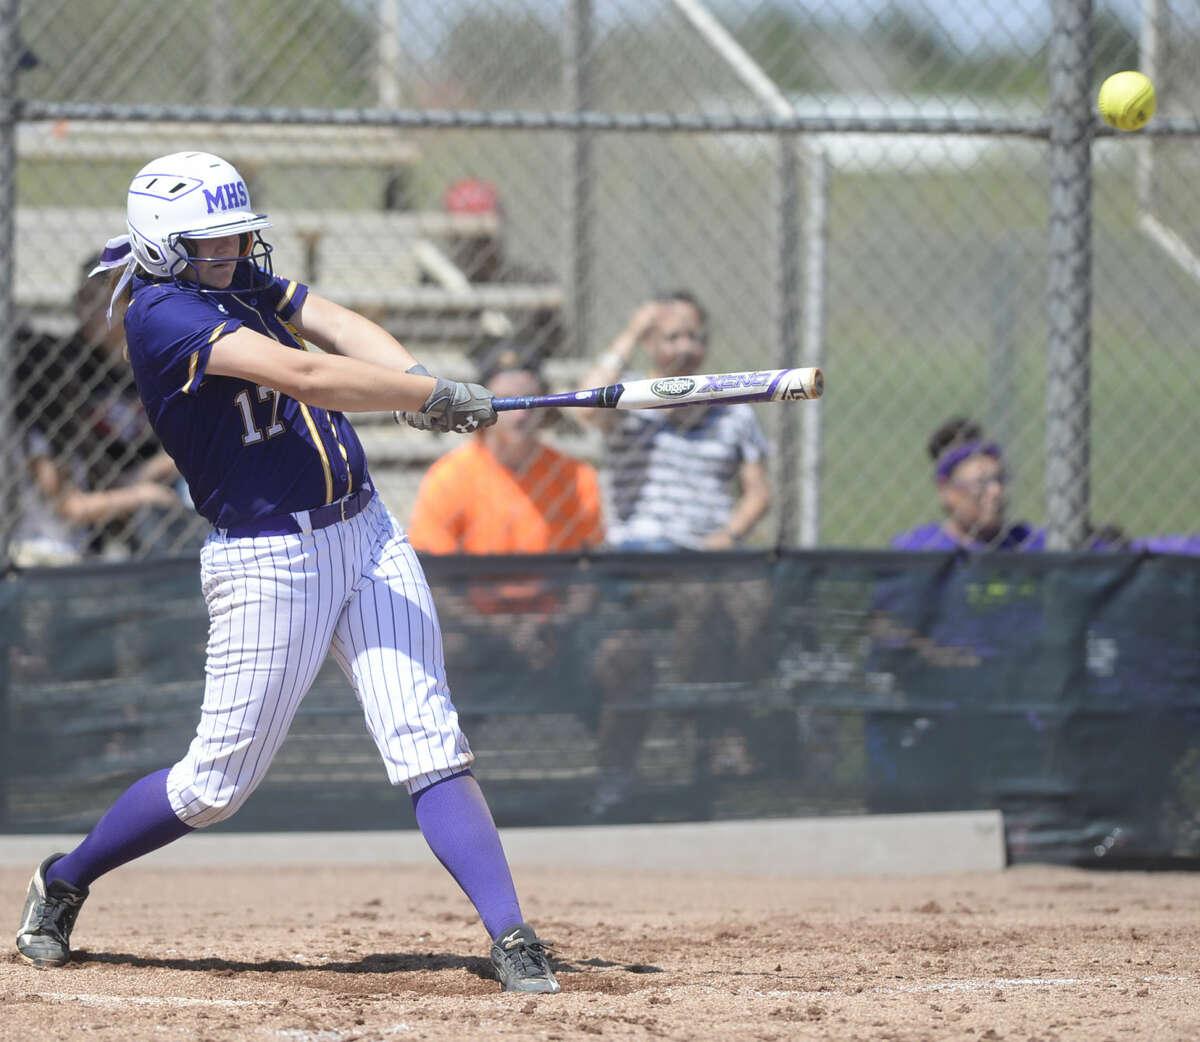 Midland High's Racey Haile (17) bats against San Angelo Central on Saturday, April 9, 2016, at Audrey Gill Softball Complex. James Durbin/Reporter-Telegram